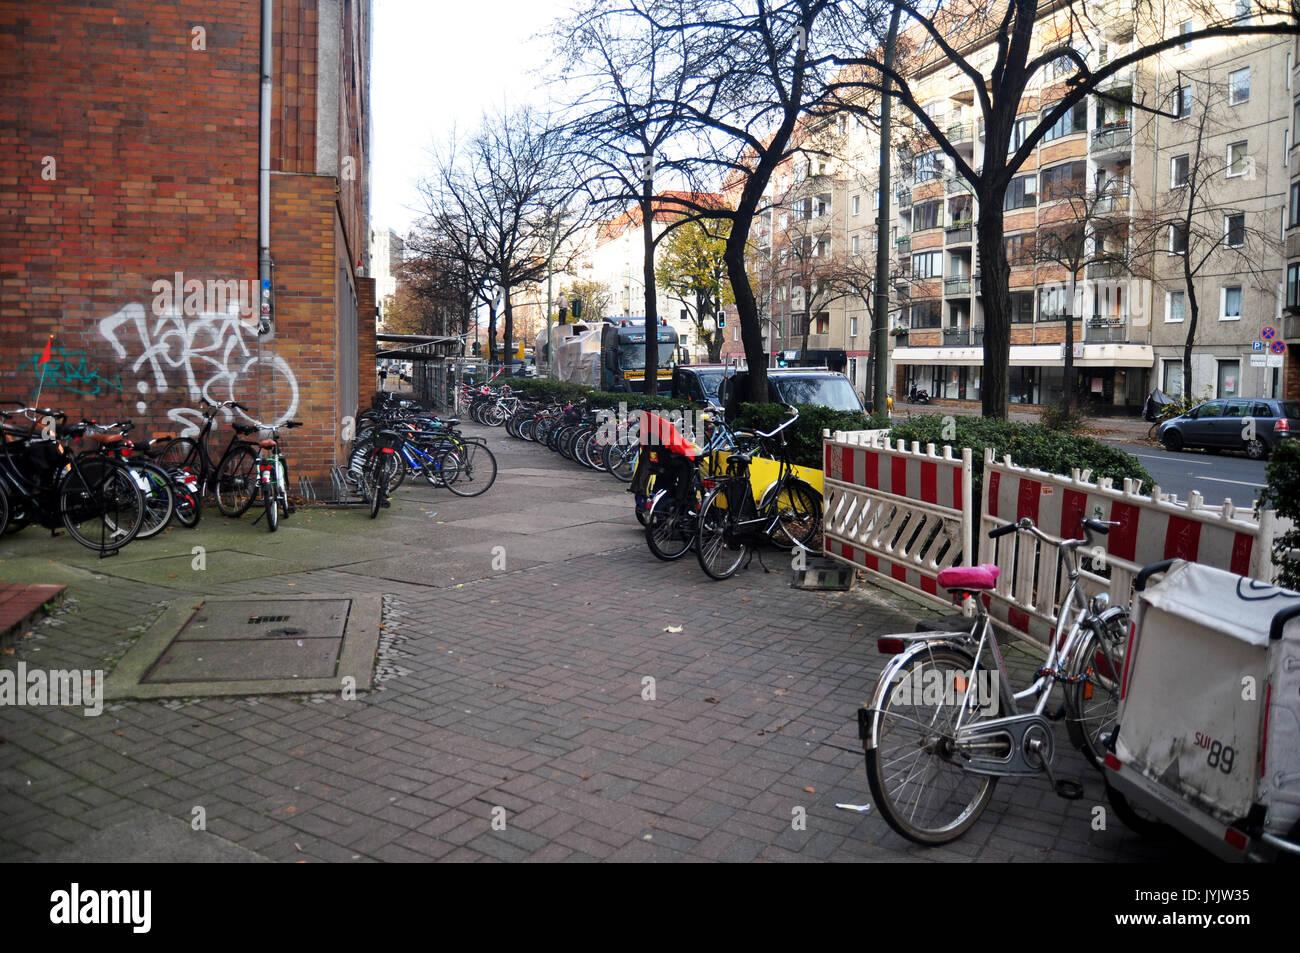 dusseldorf bike stock photos dusseldorf bike stock. Black Bedroom Furniture Sets. Home Design Ideas